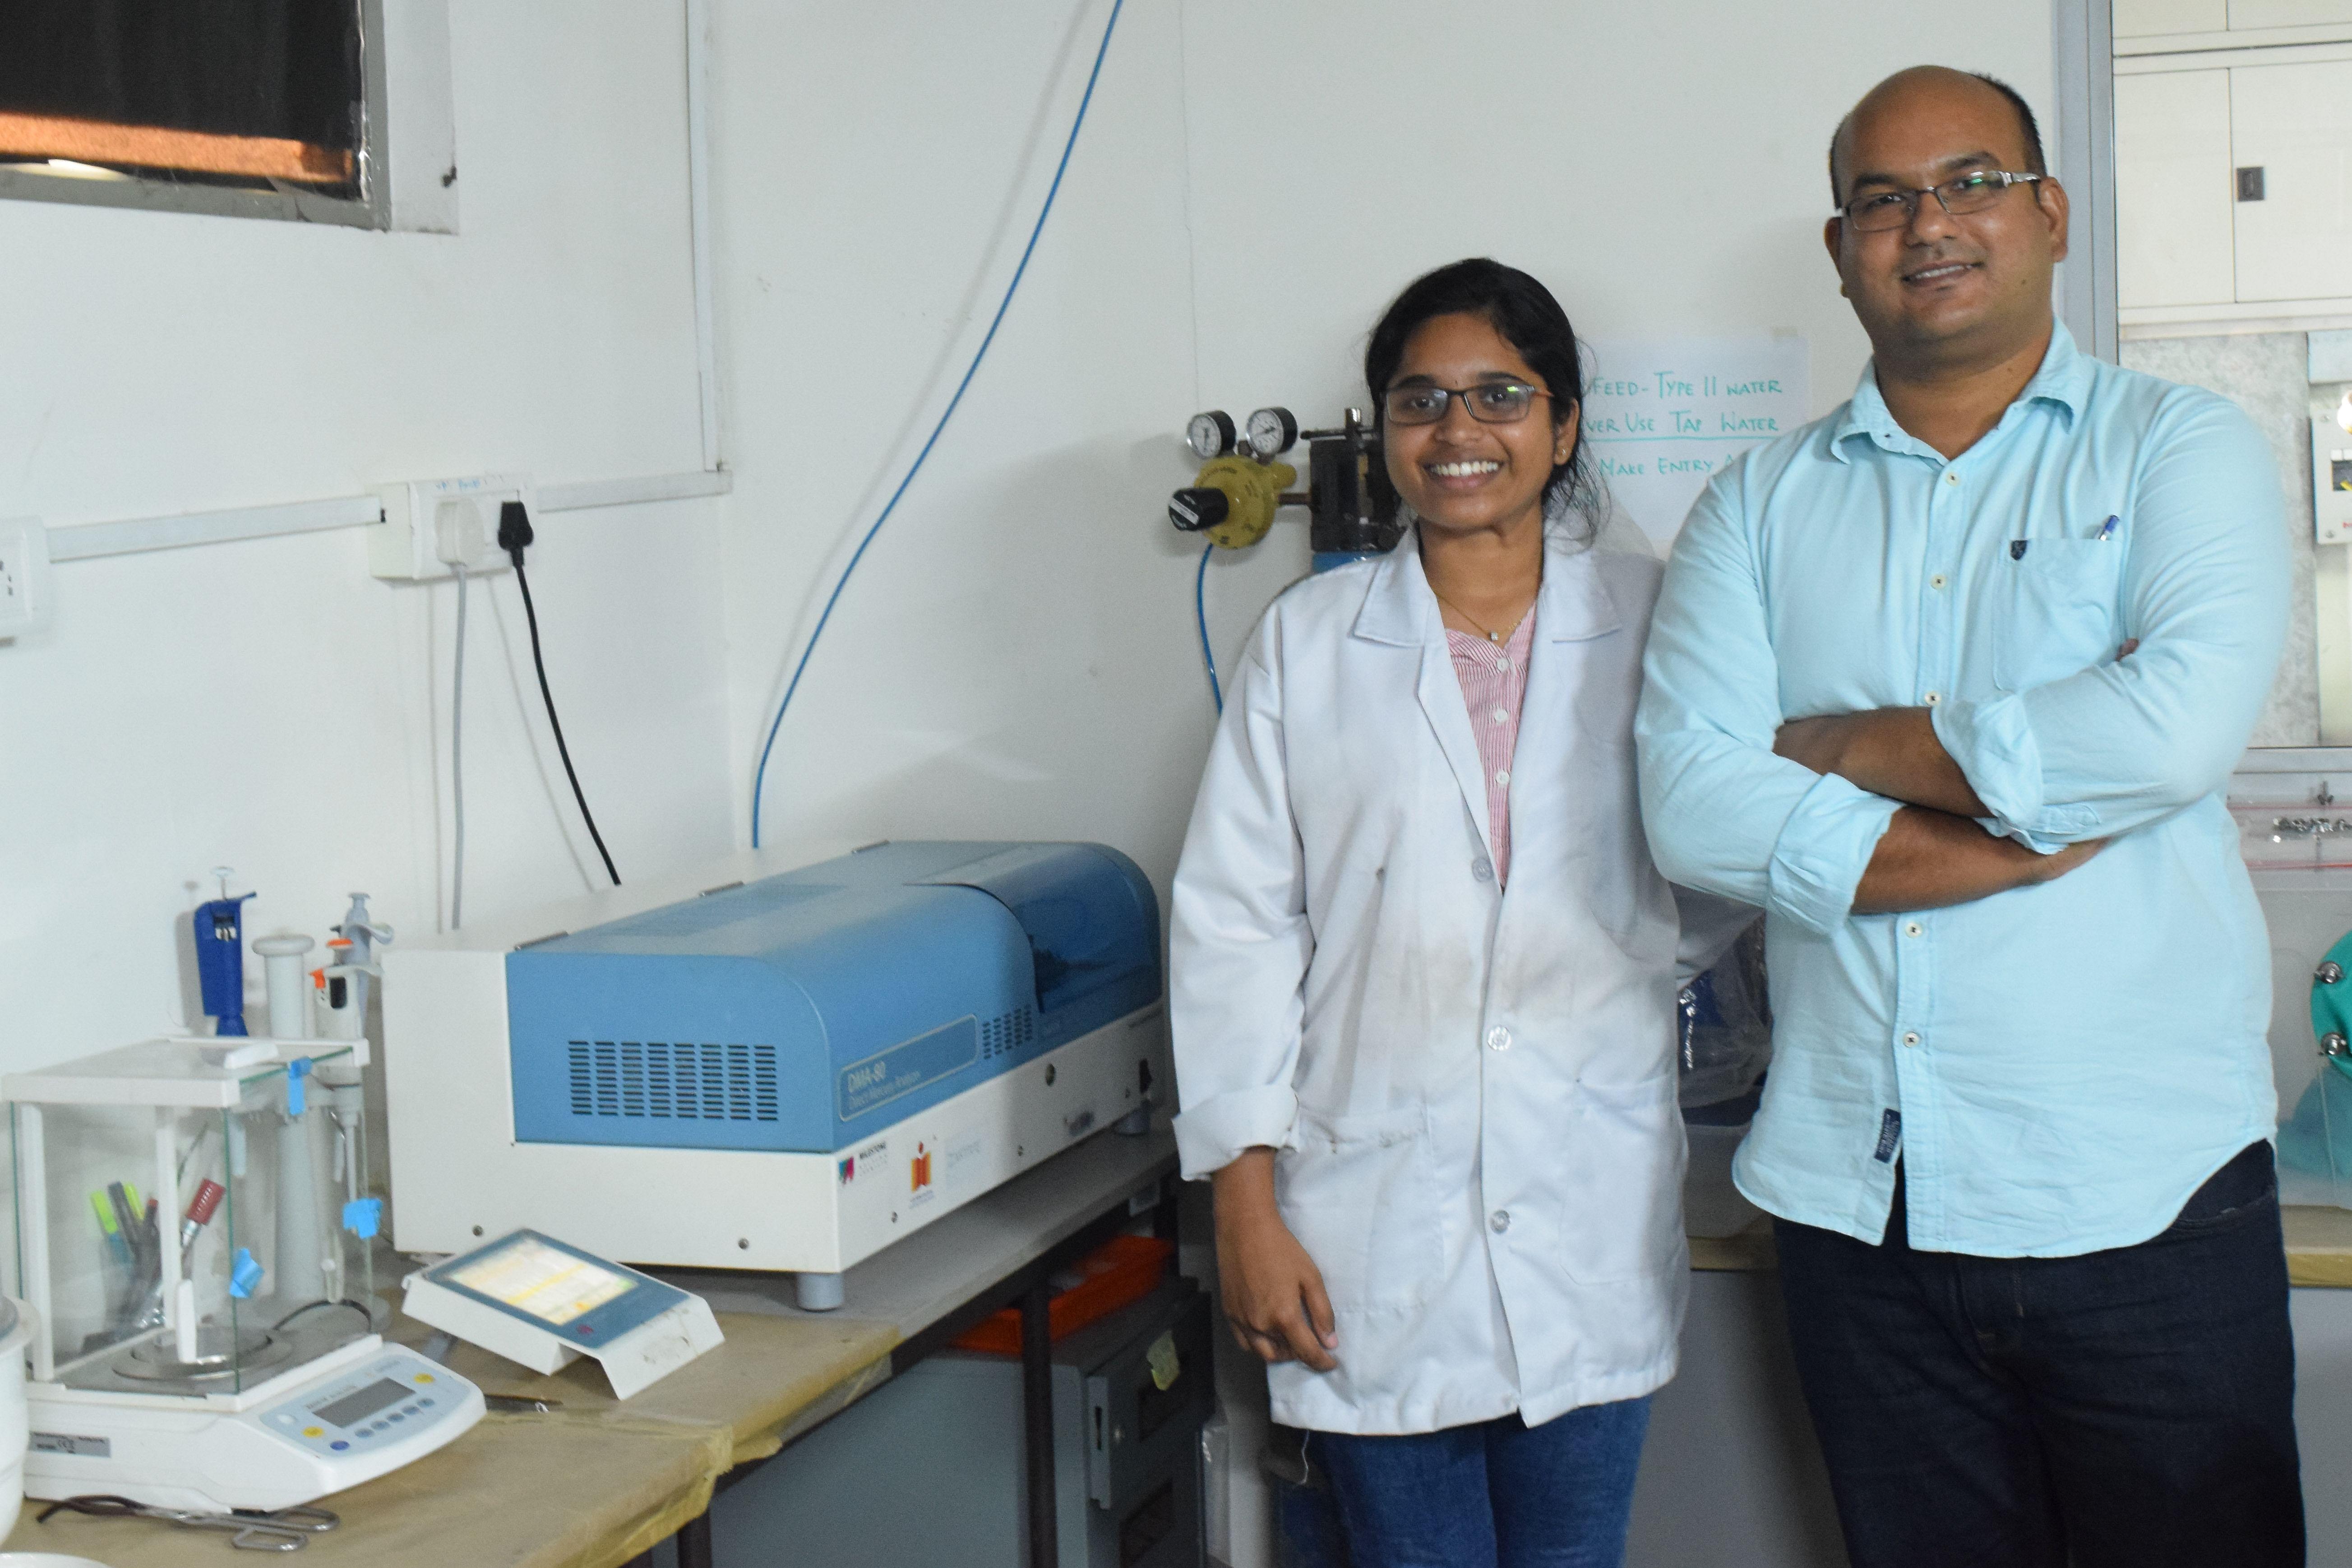 Dr. Asif Qureshi (R), Associate Professor, Dept of Civil Engineering, IIT-H & his PhD student Dr. Subhavana Katakam (L) (Source: IIT Hyderabad)